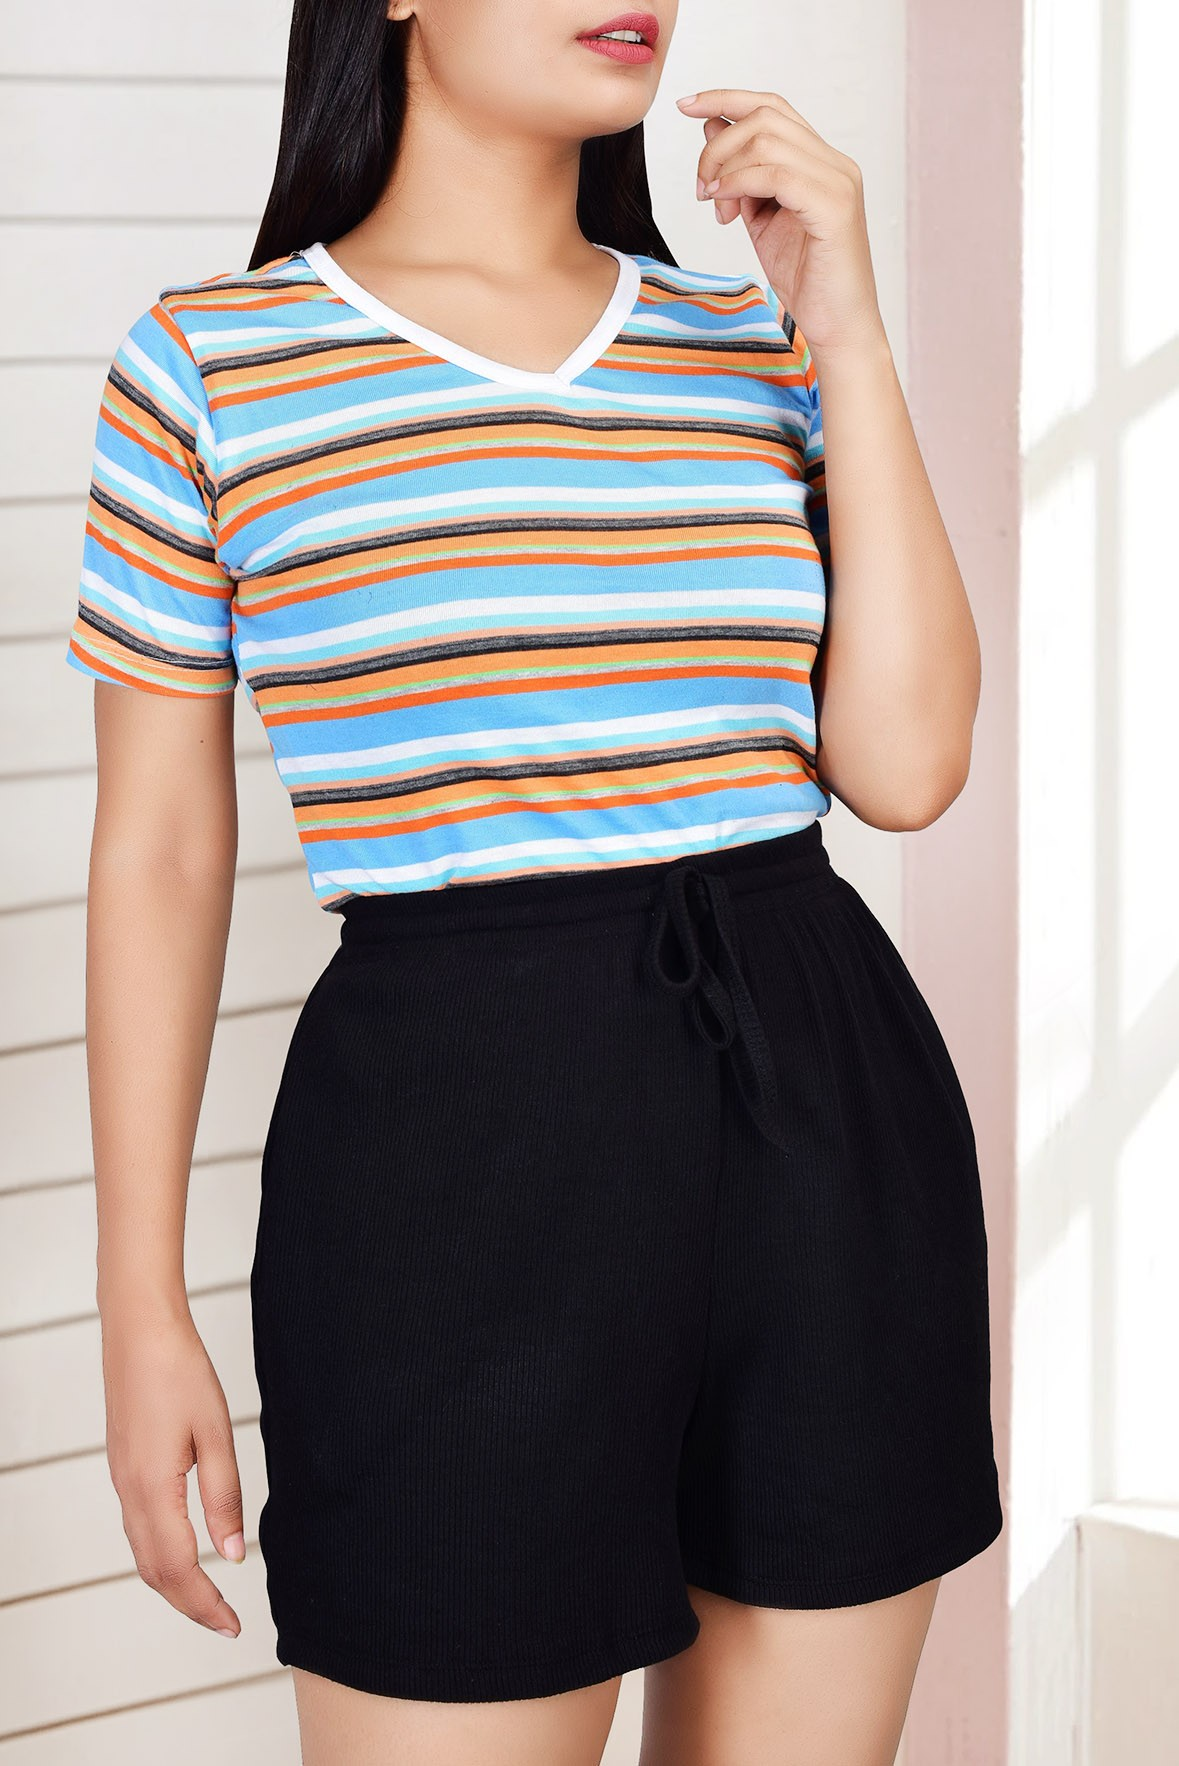 Colored stripes v neck top